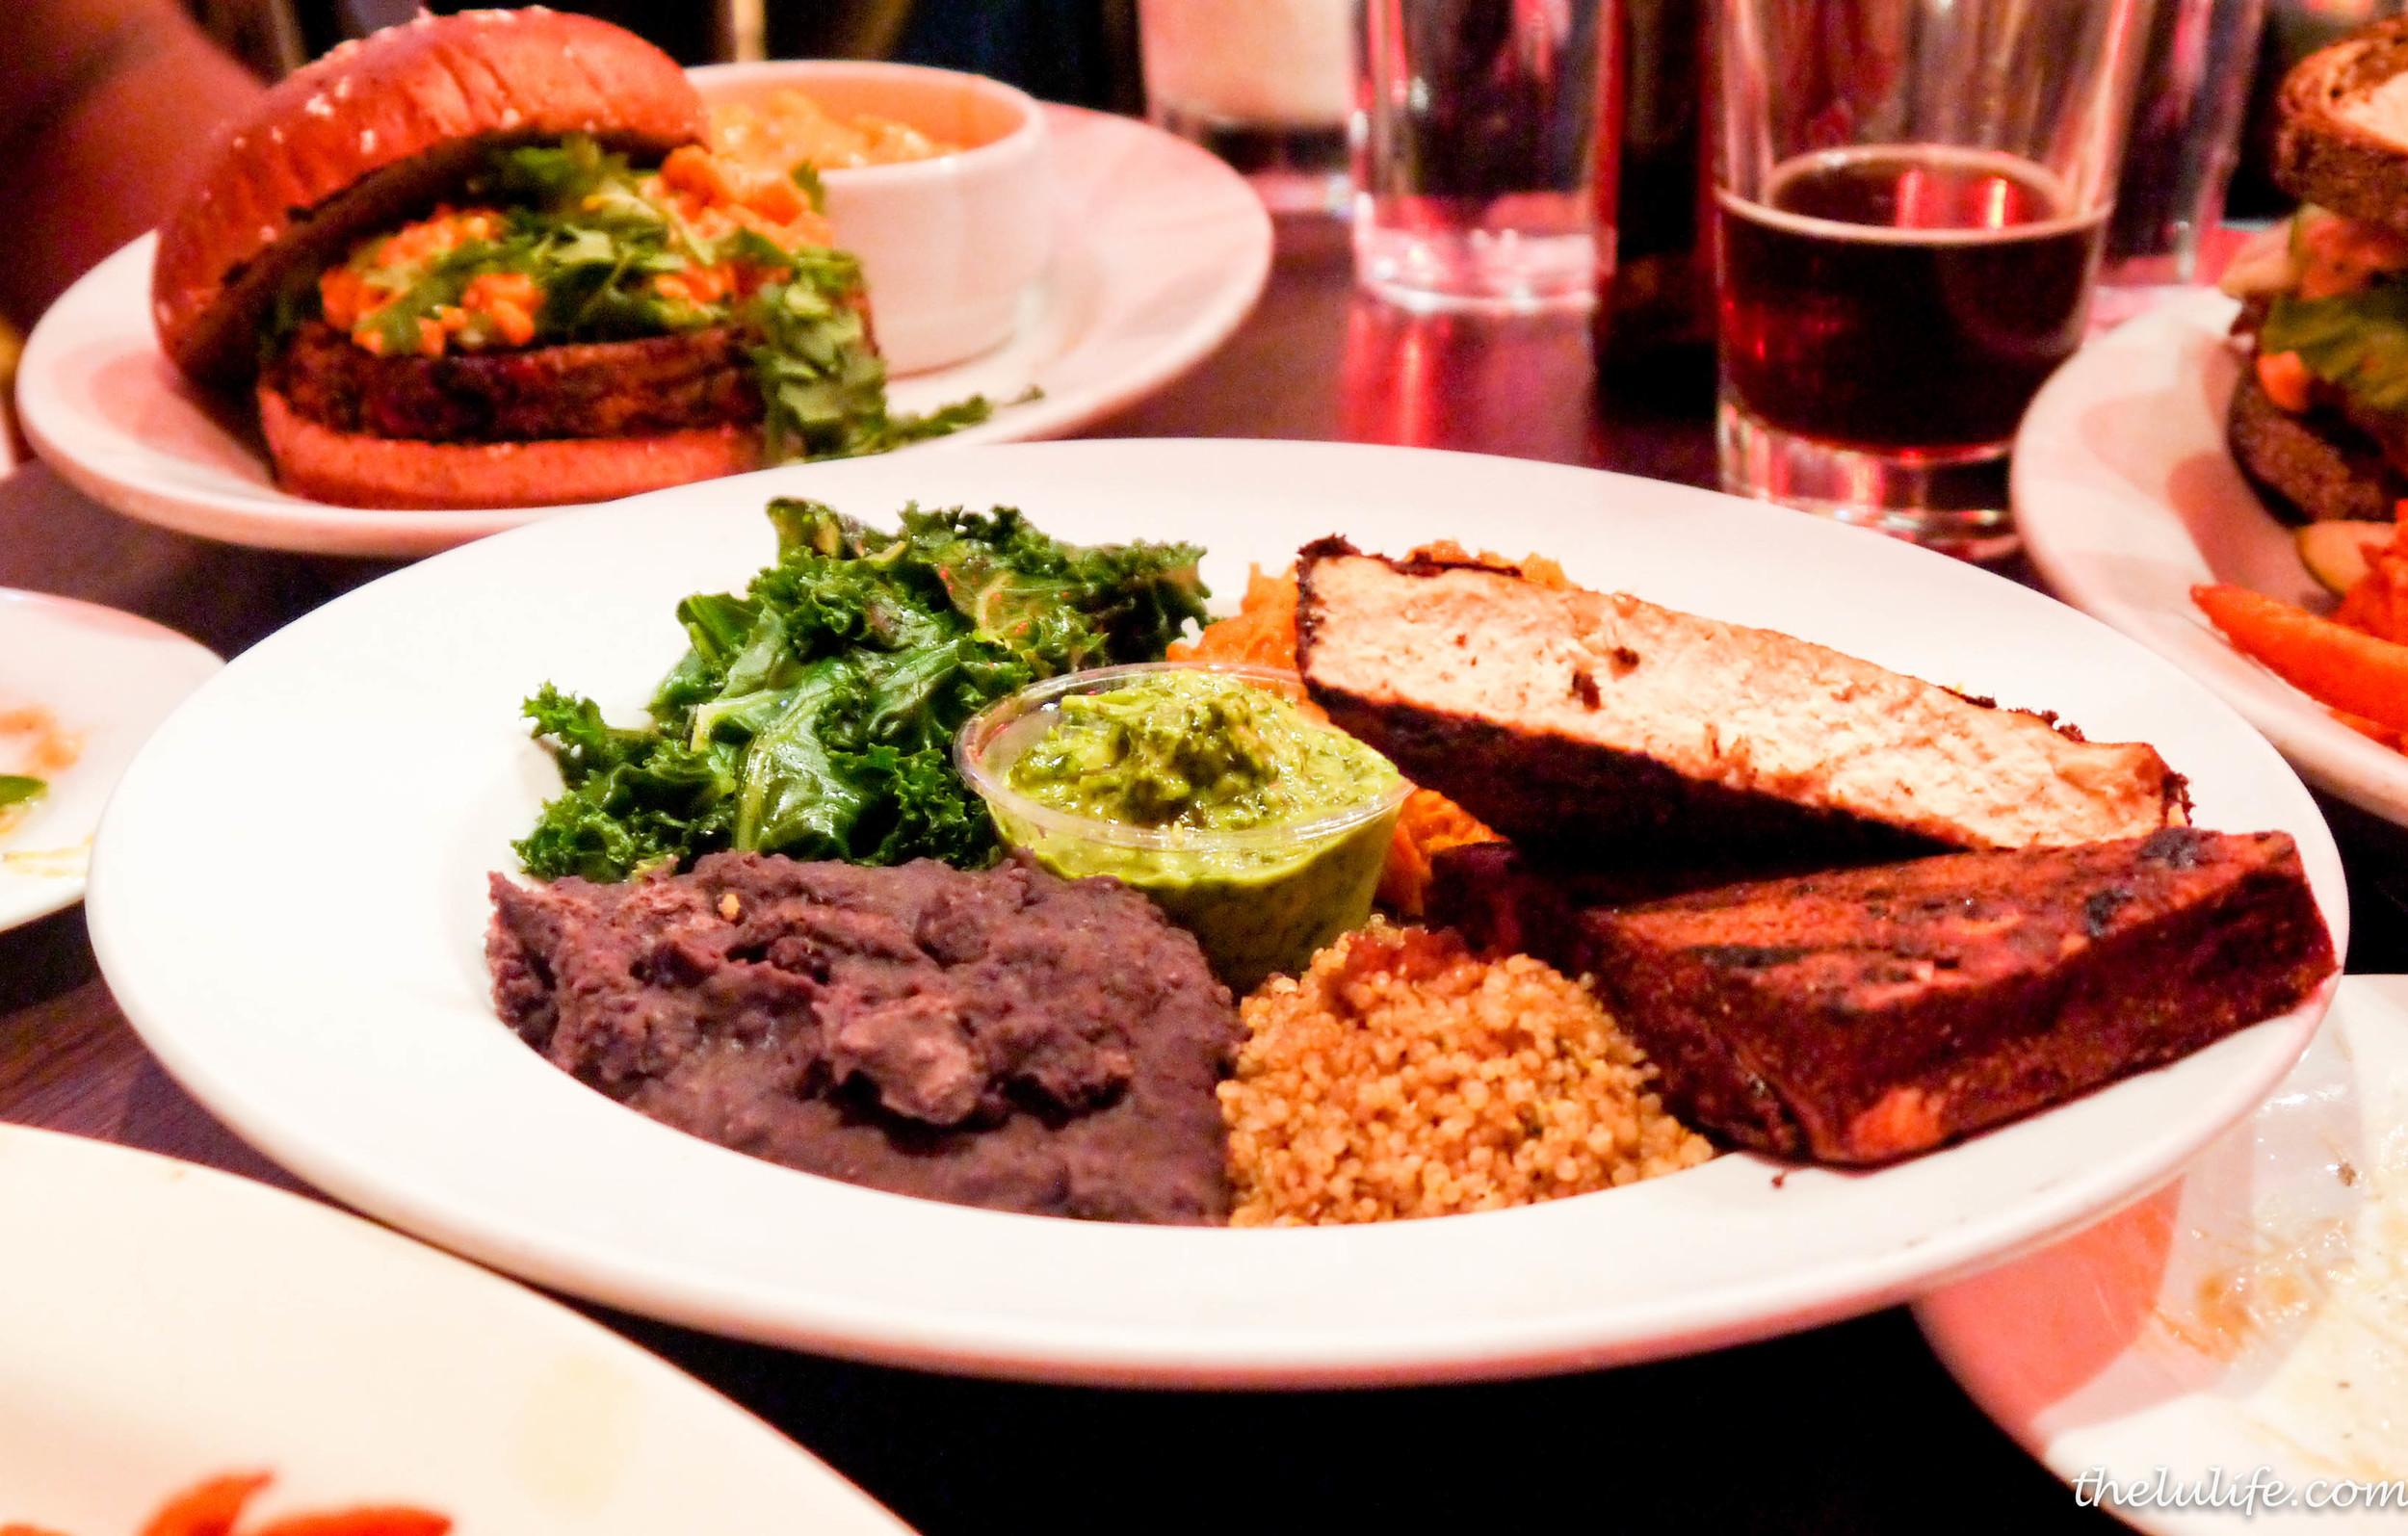 The Soul Bowl - seasoned quinoa, spicy blackened tofu, chimichurri sauce, charred balsamic brussels, mashed sweet potatoes and fat free black beans